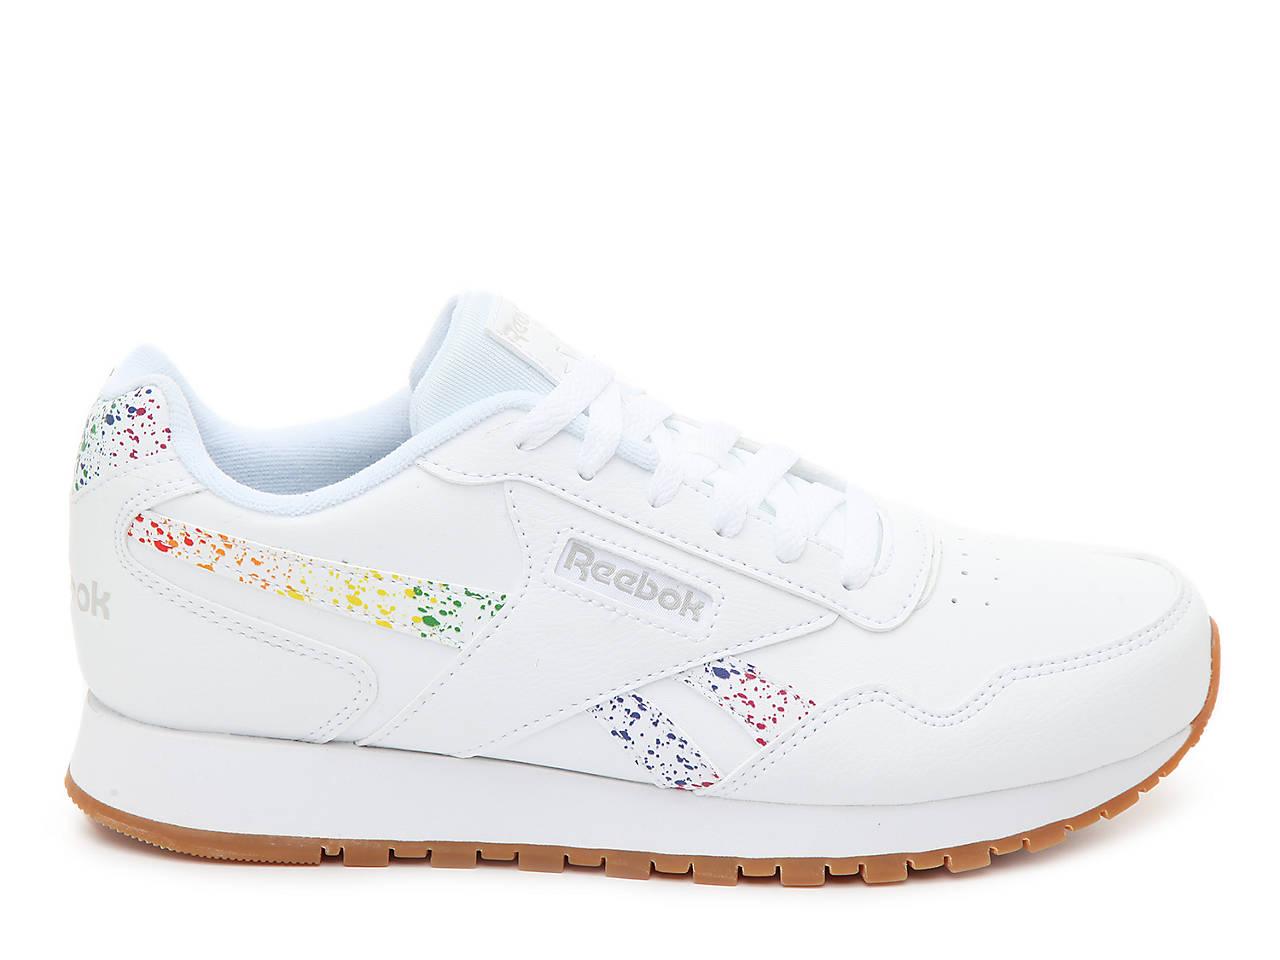 1b92e8f9 Pride Harman Run Sneaker - Women's